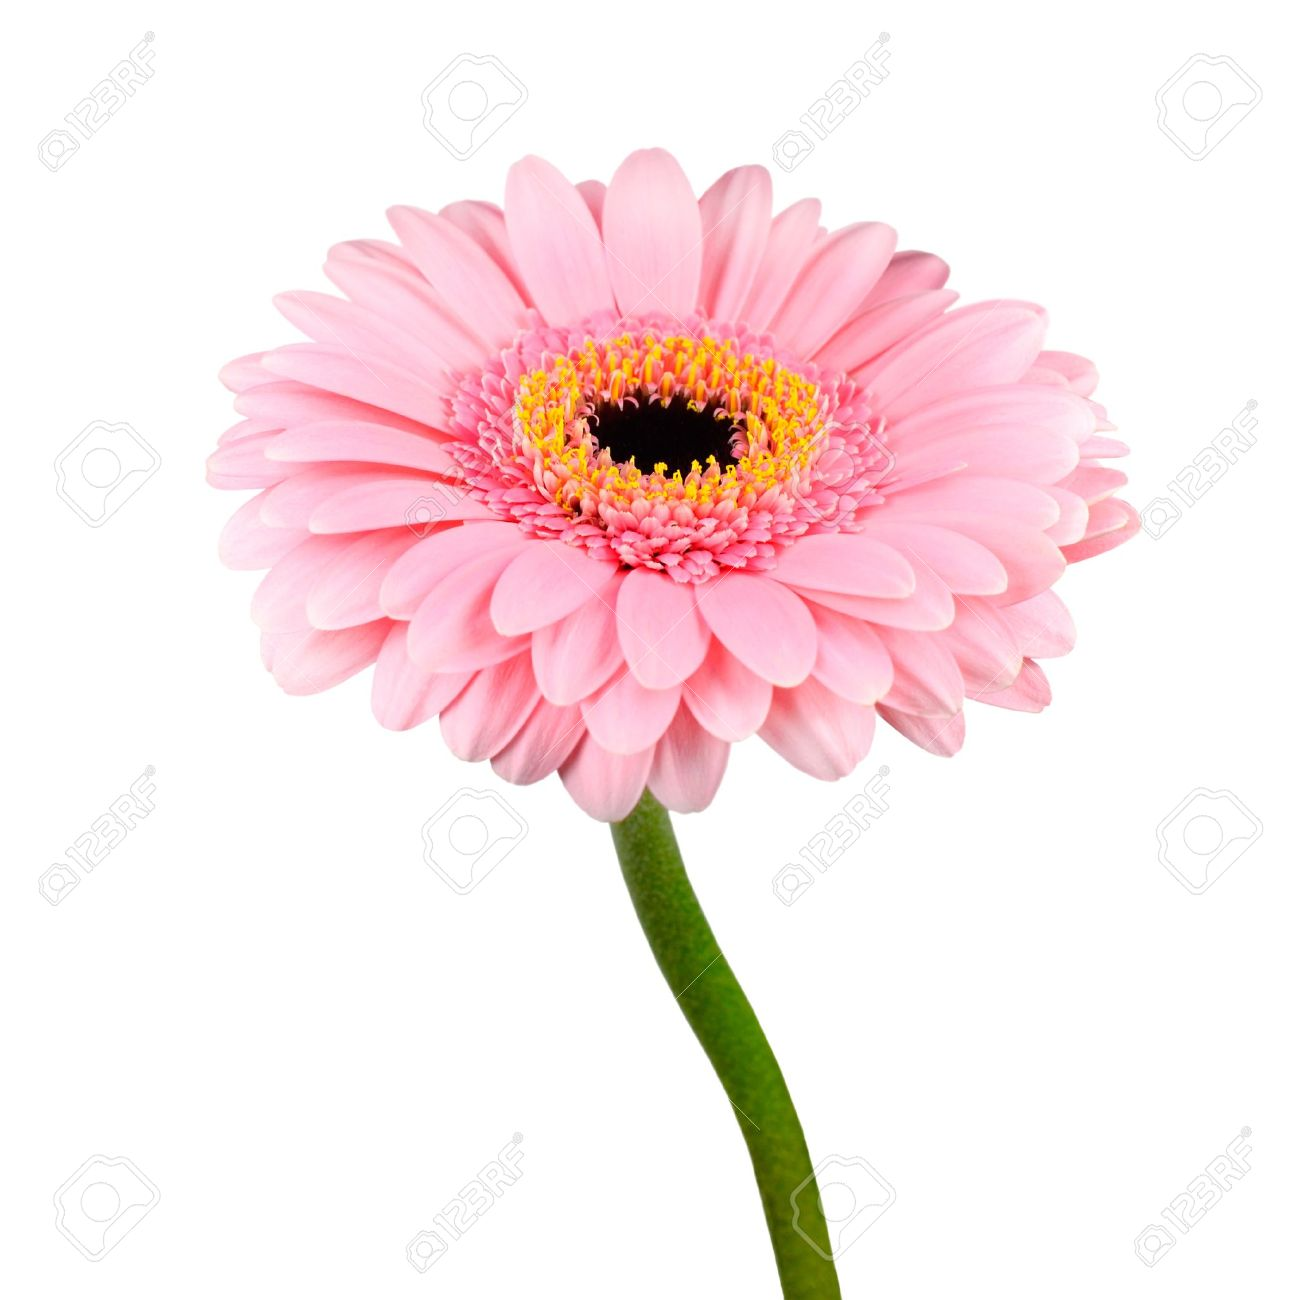 Gerbera Rose Fleur Avec Tige Verte Isolee Sur Fond Blanc Banque D